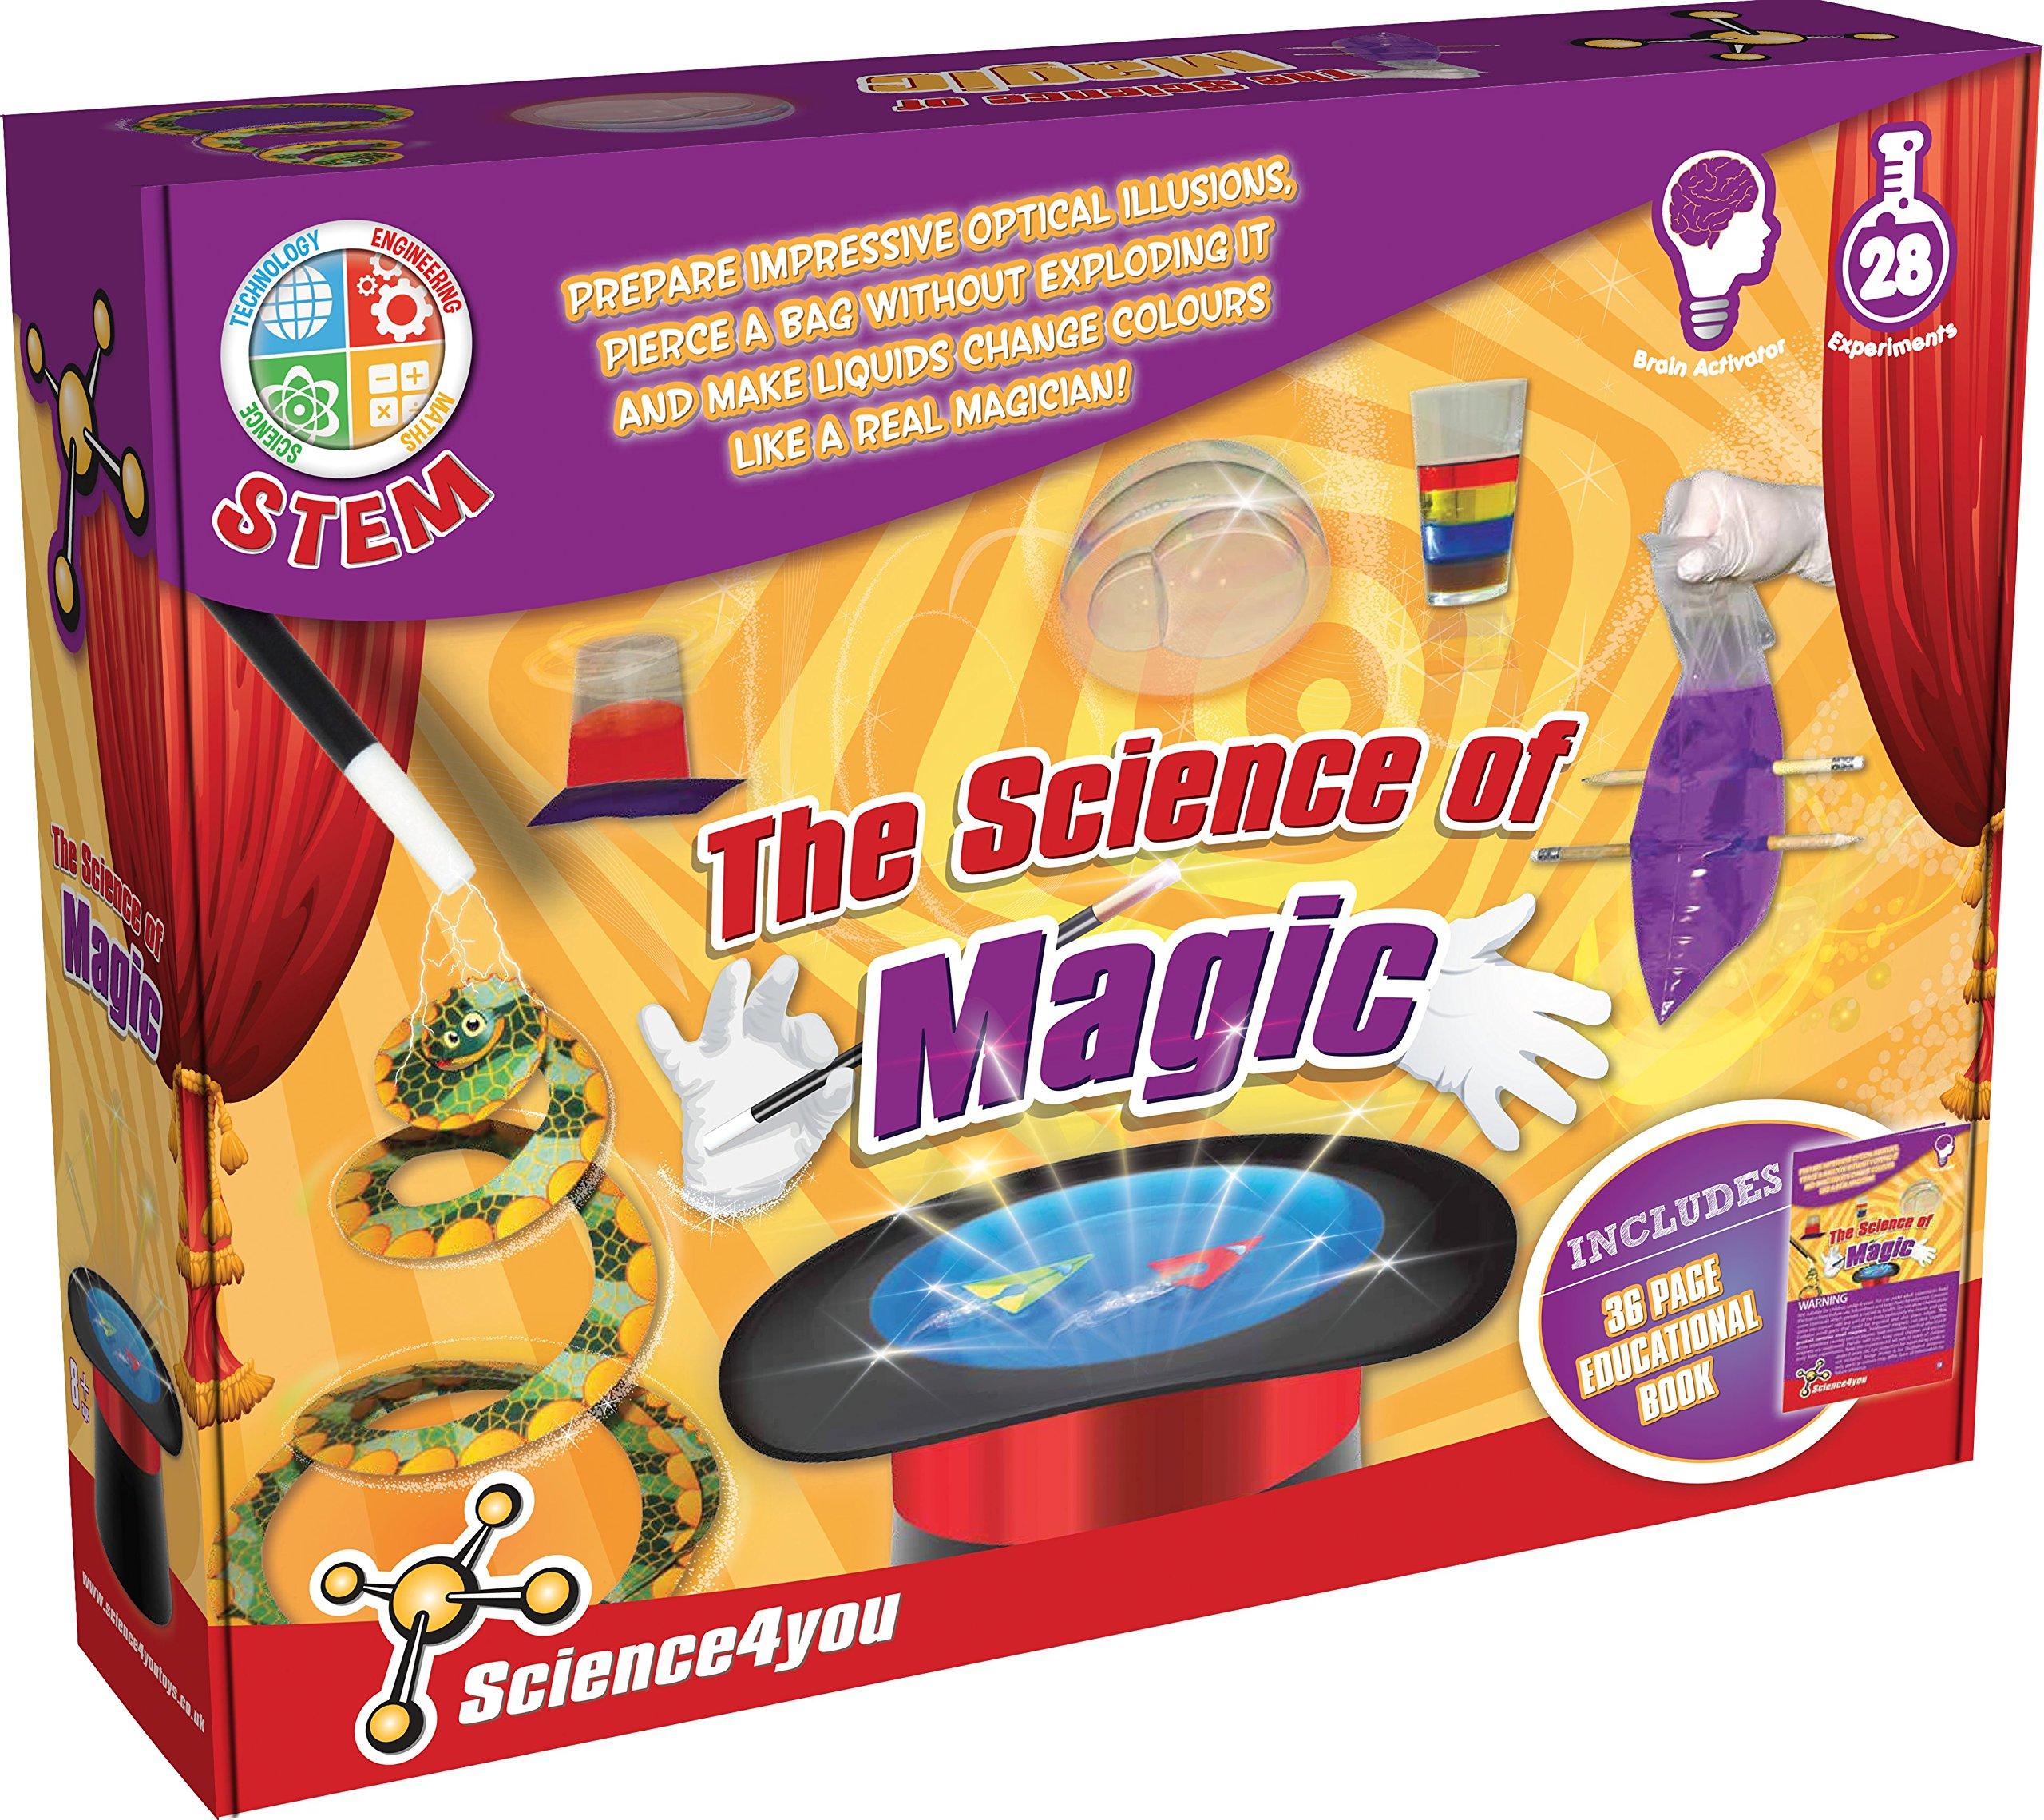 Wissenschaft-4-You-sy603950-Magic-Set